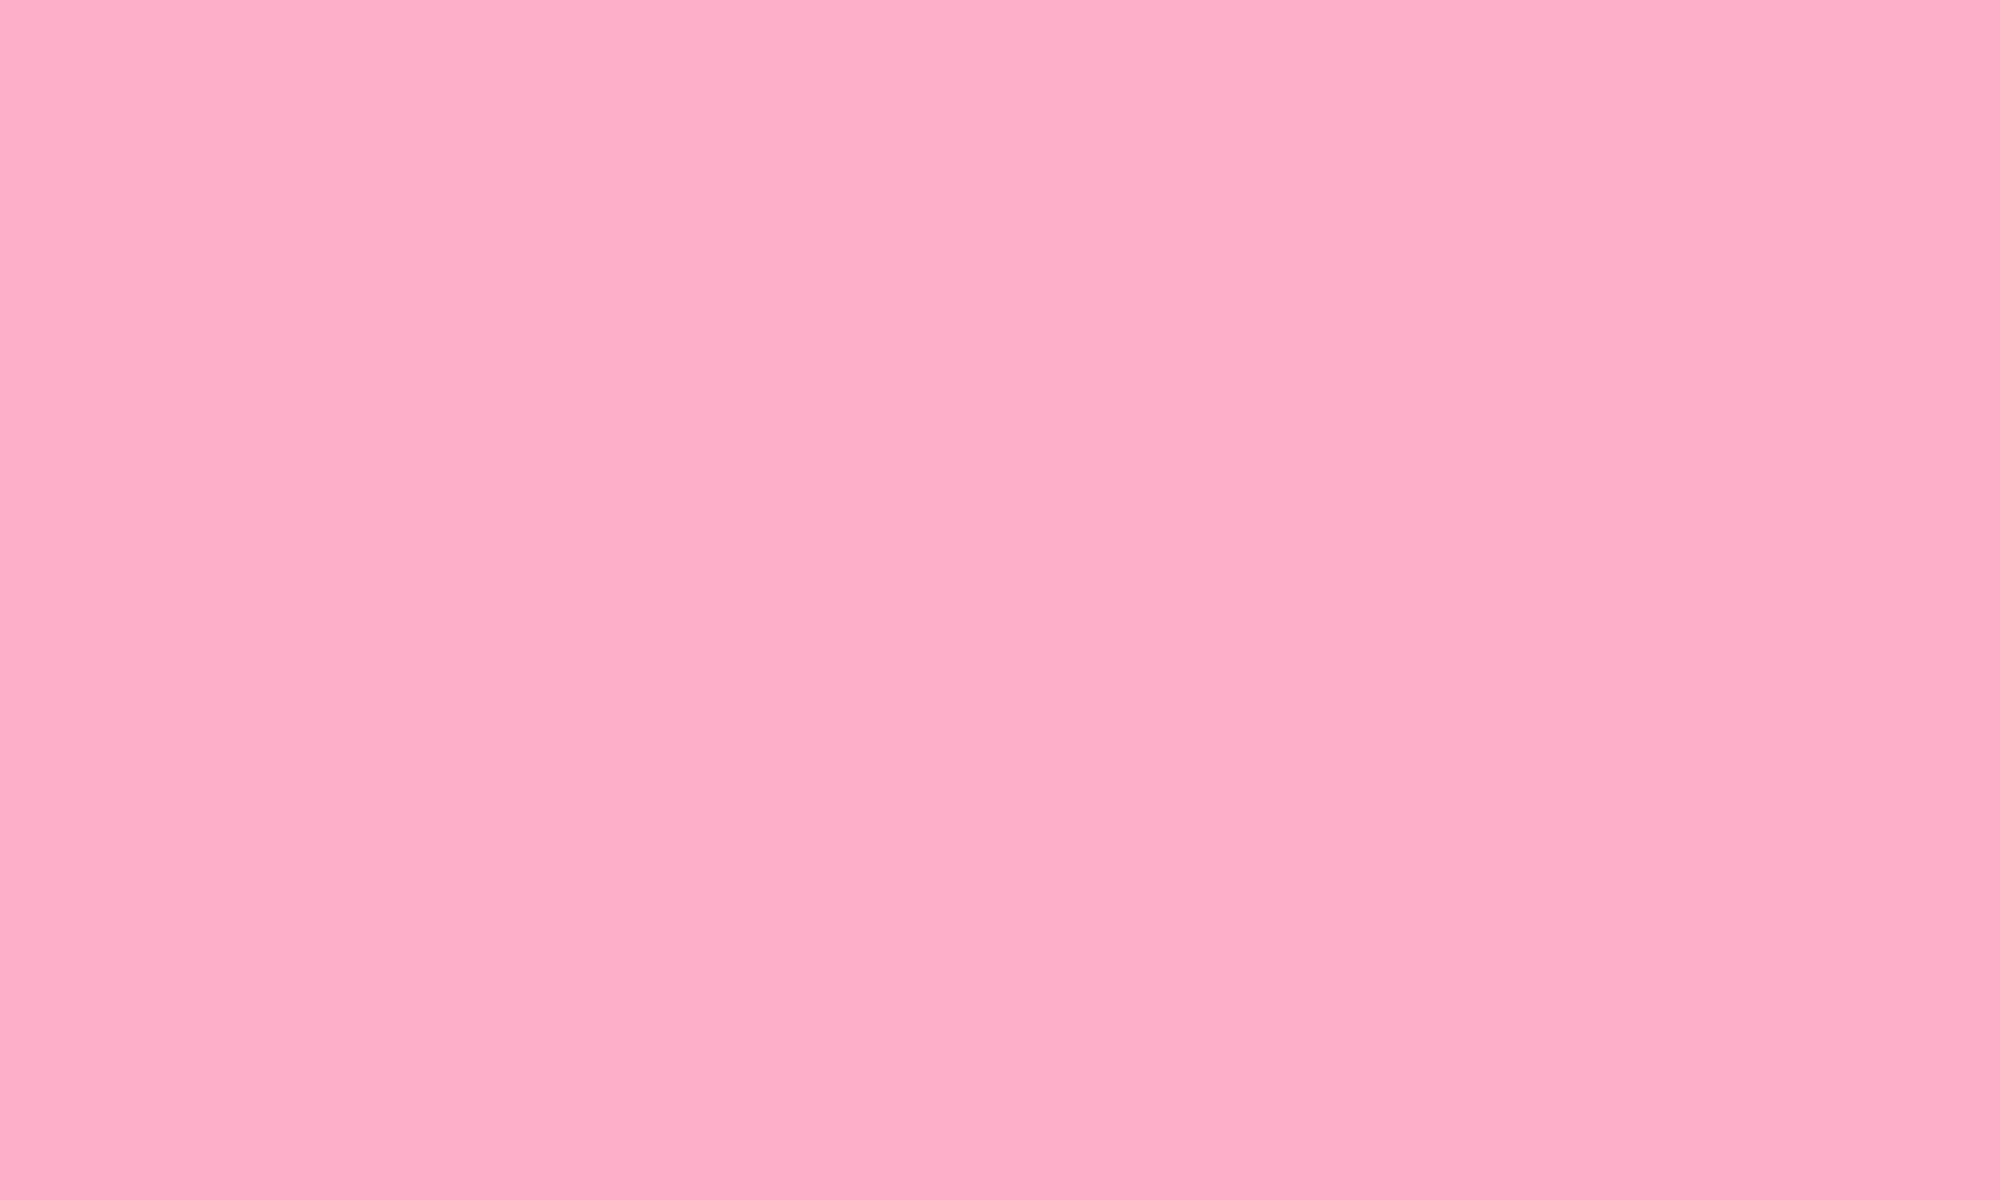 Pink Limousine mieten - Pink Stretch Limo mieten